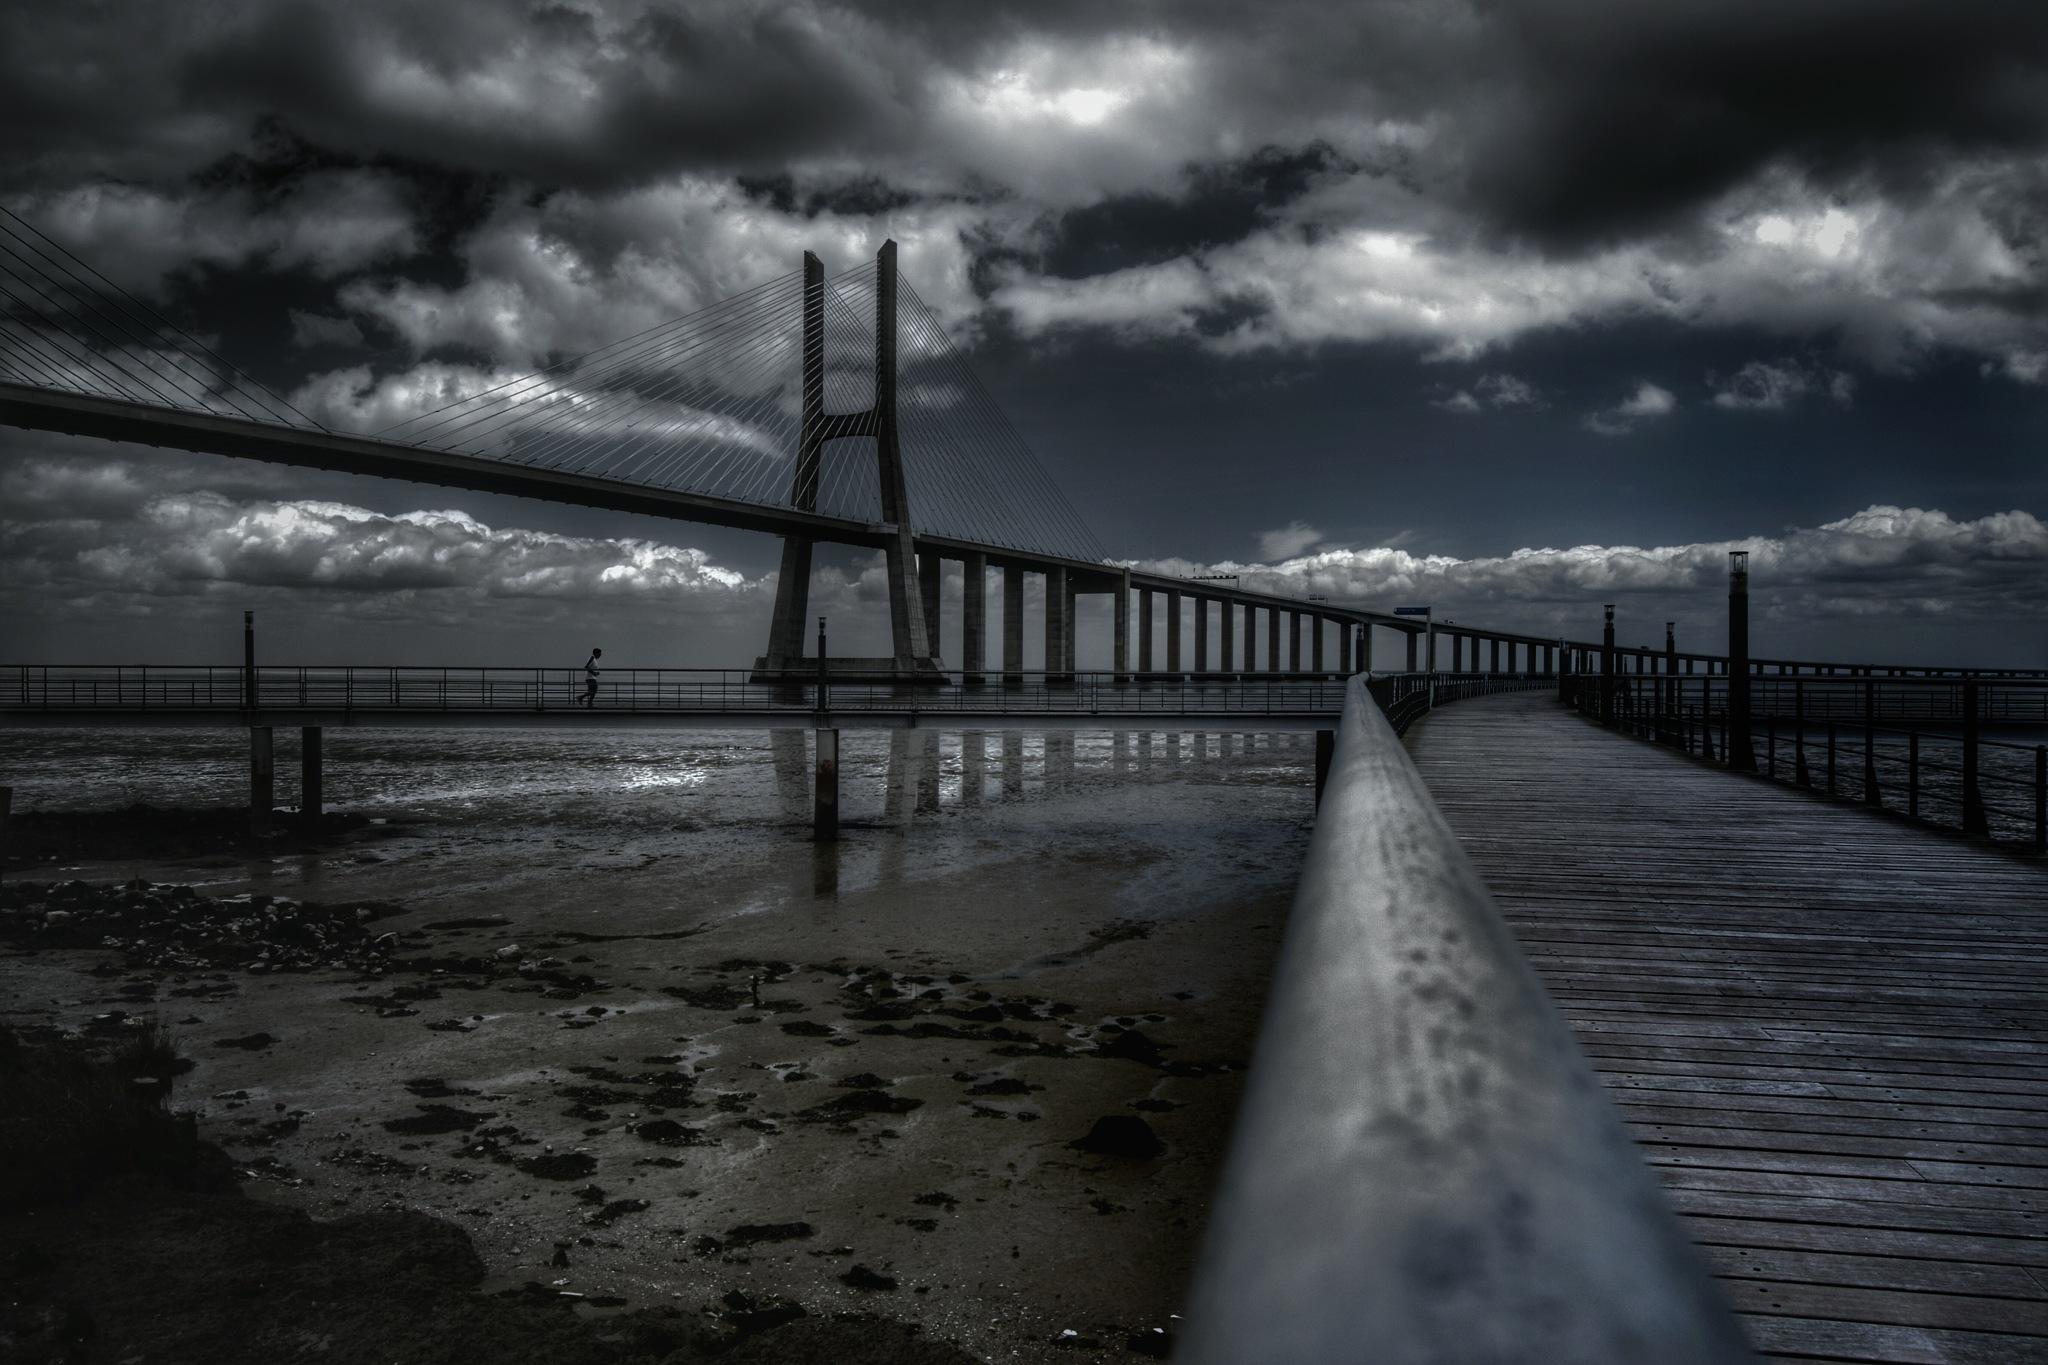 Vasco da Gama Bridge by MiguelMartins